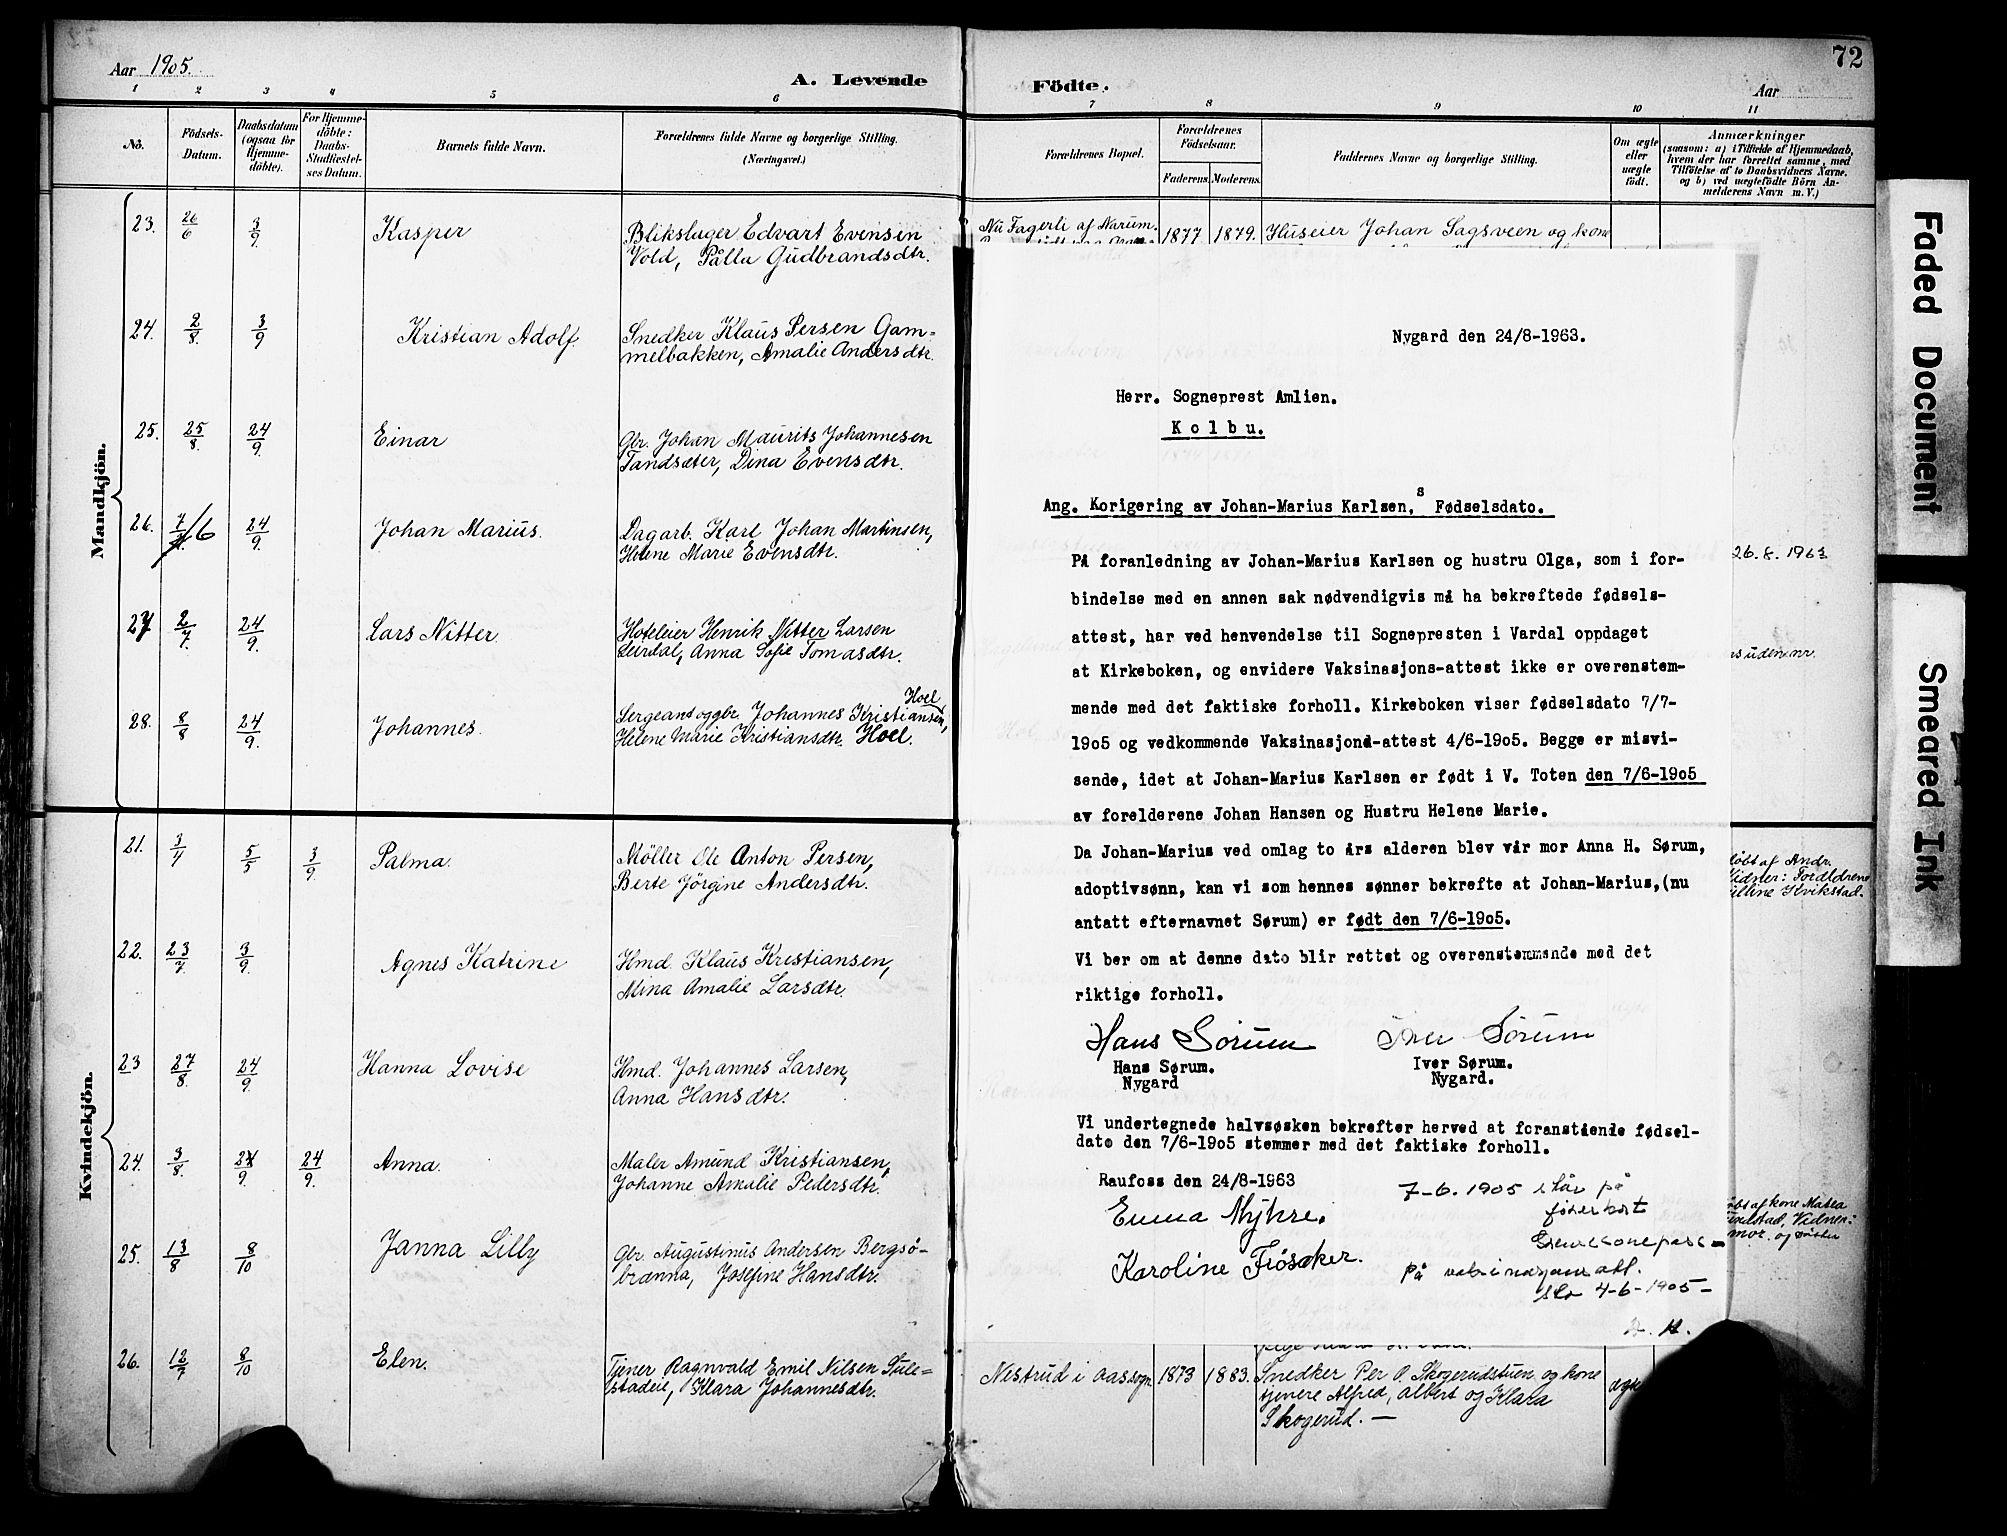 SAH, Vestre Toten prestekontor, H/Ha/Haa/L0013: Ministerialbok nr. 13, 1895-1911, s. 72